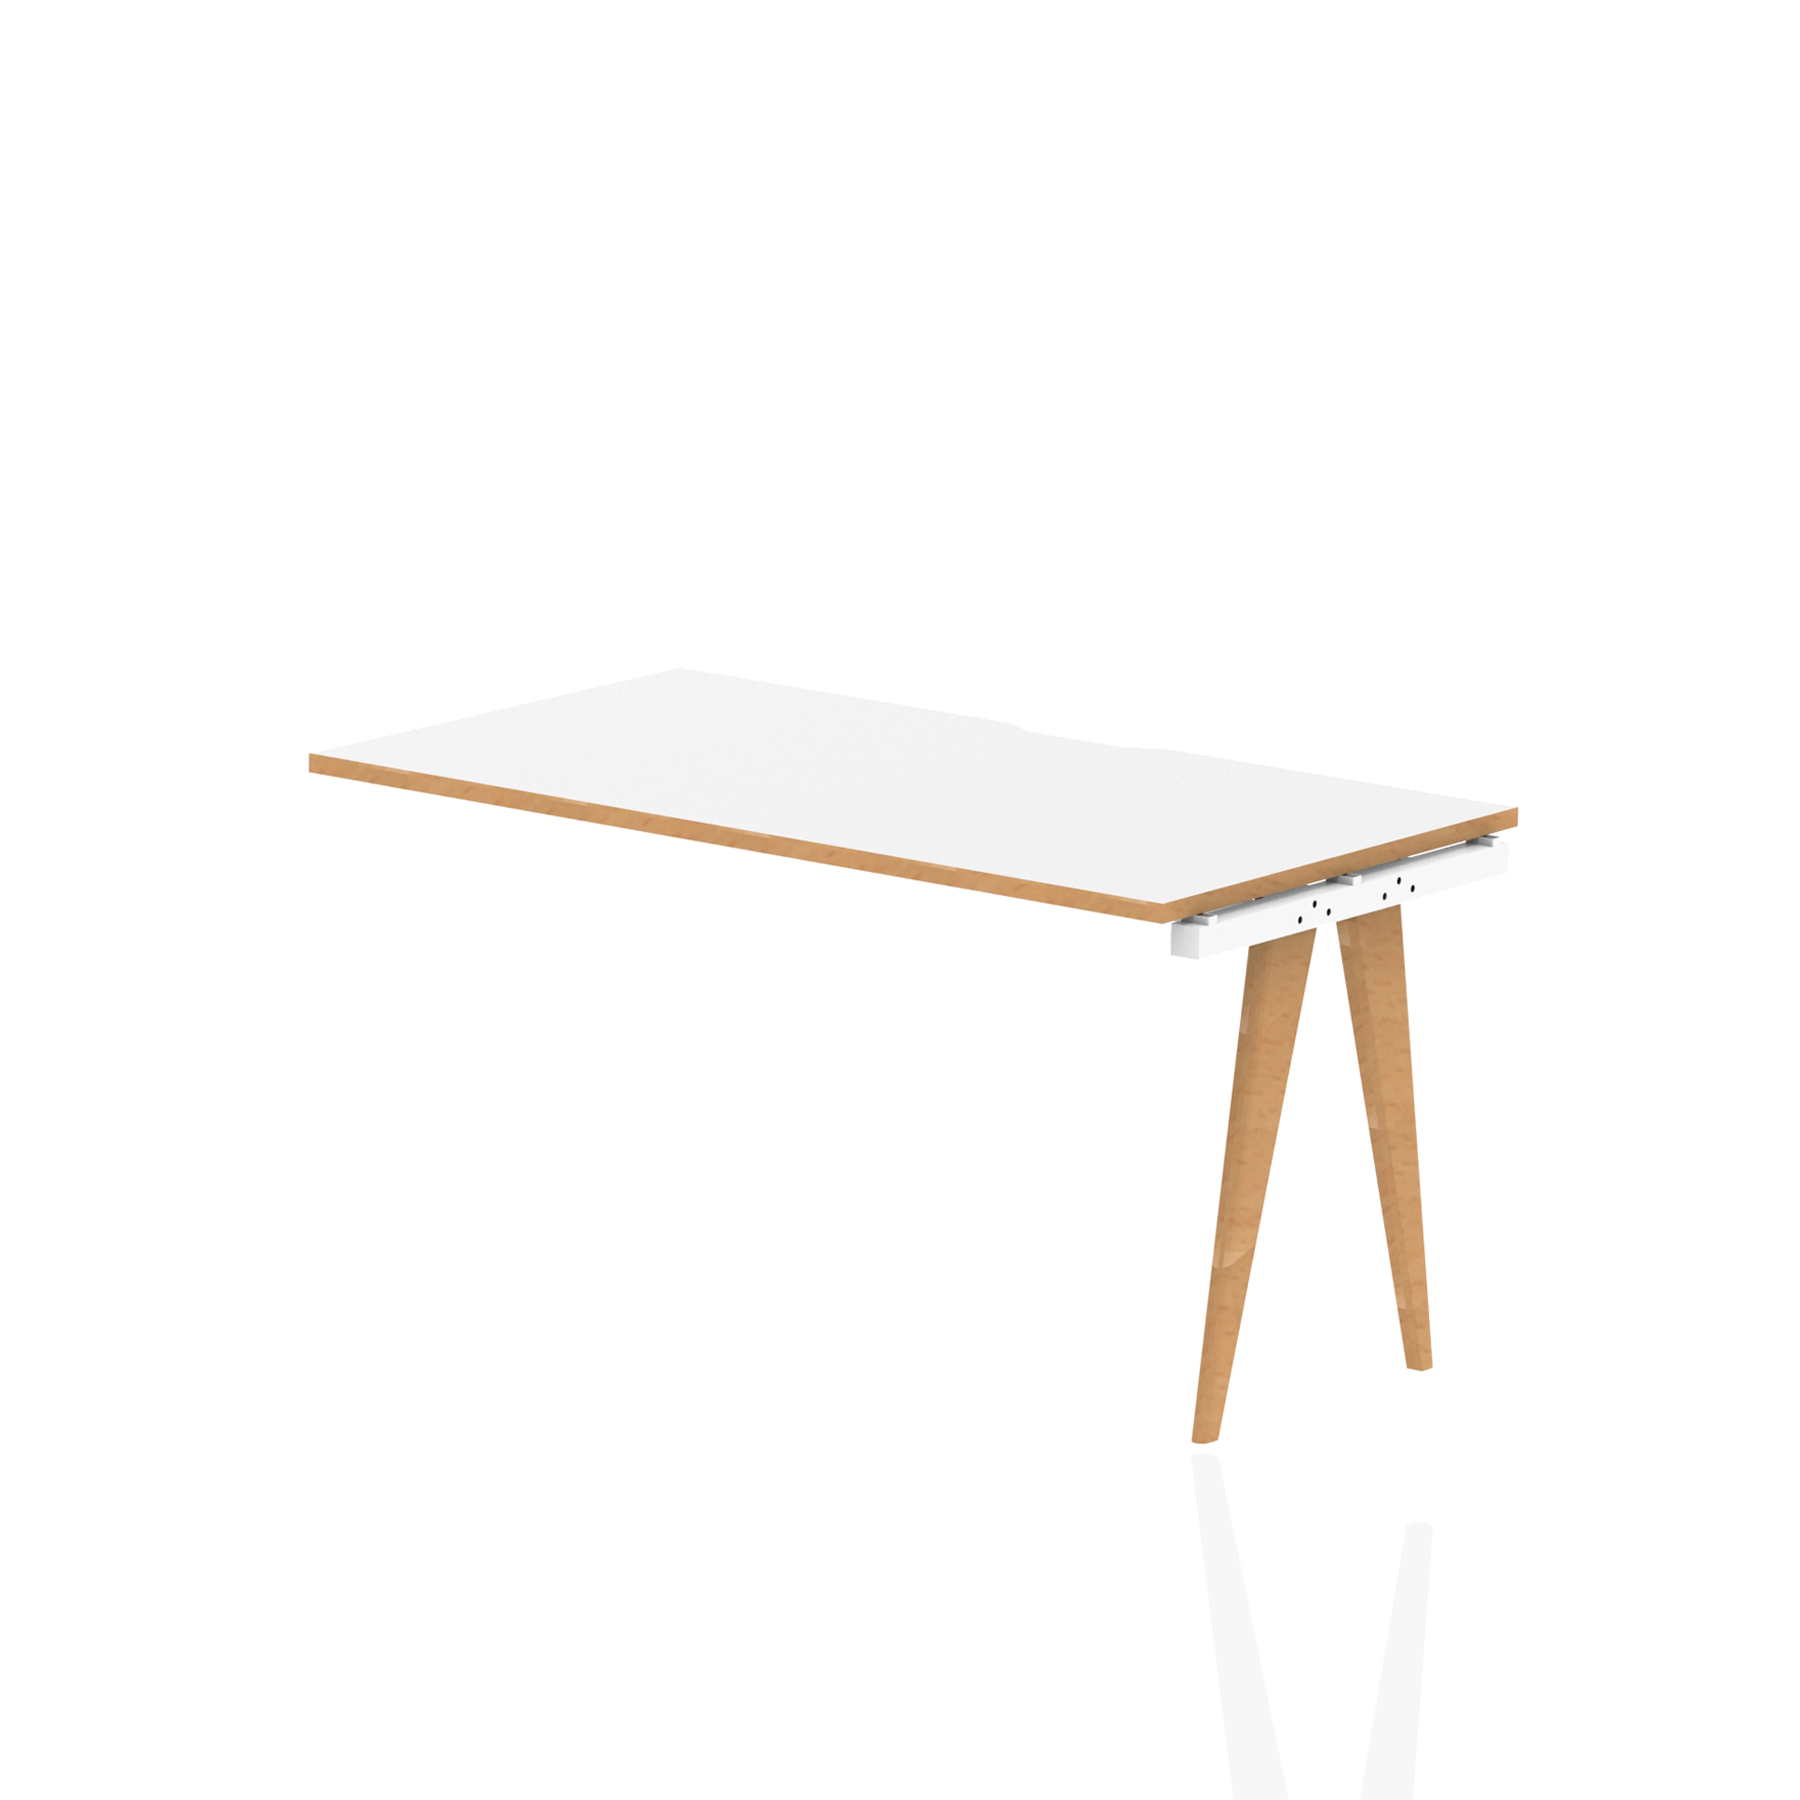 Oslo Single Ext Kit White Frame Wooden Leg Bench Desk 1200 White With Natural Wood Edge